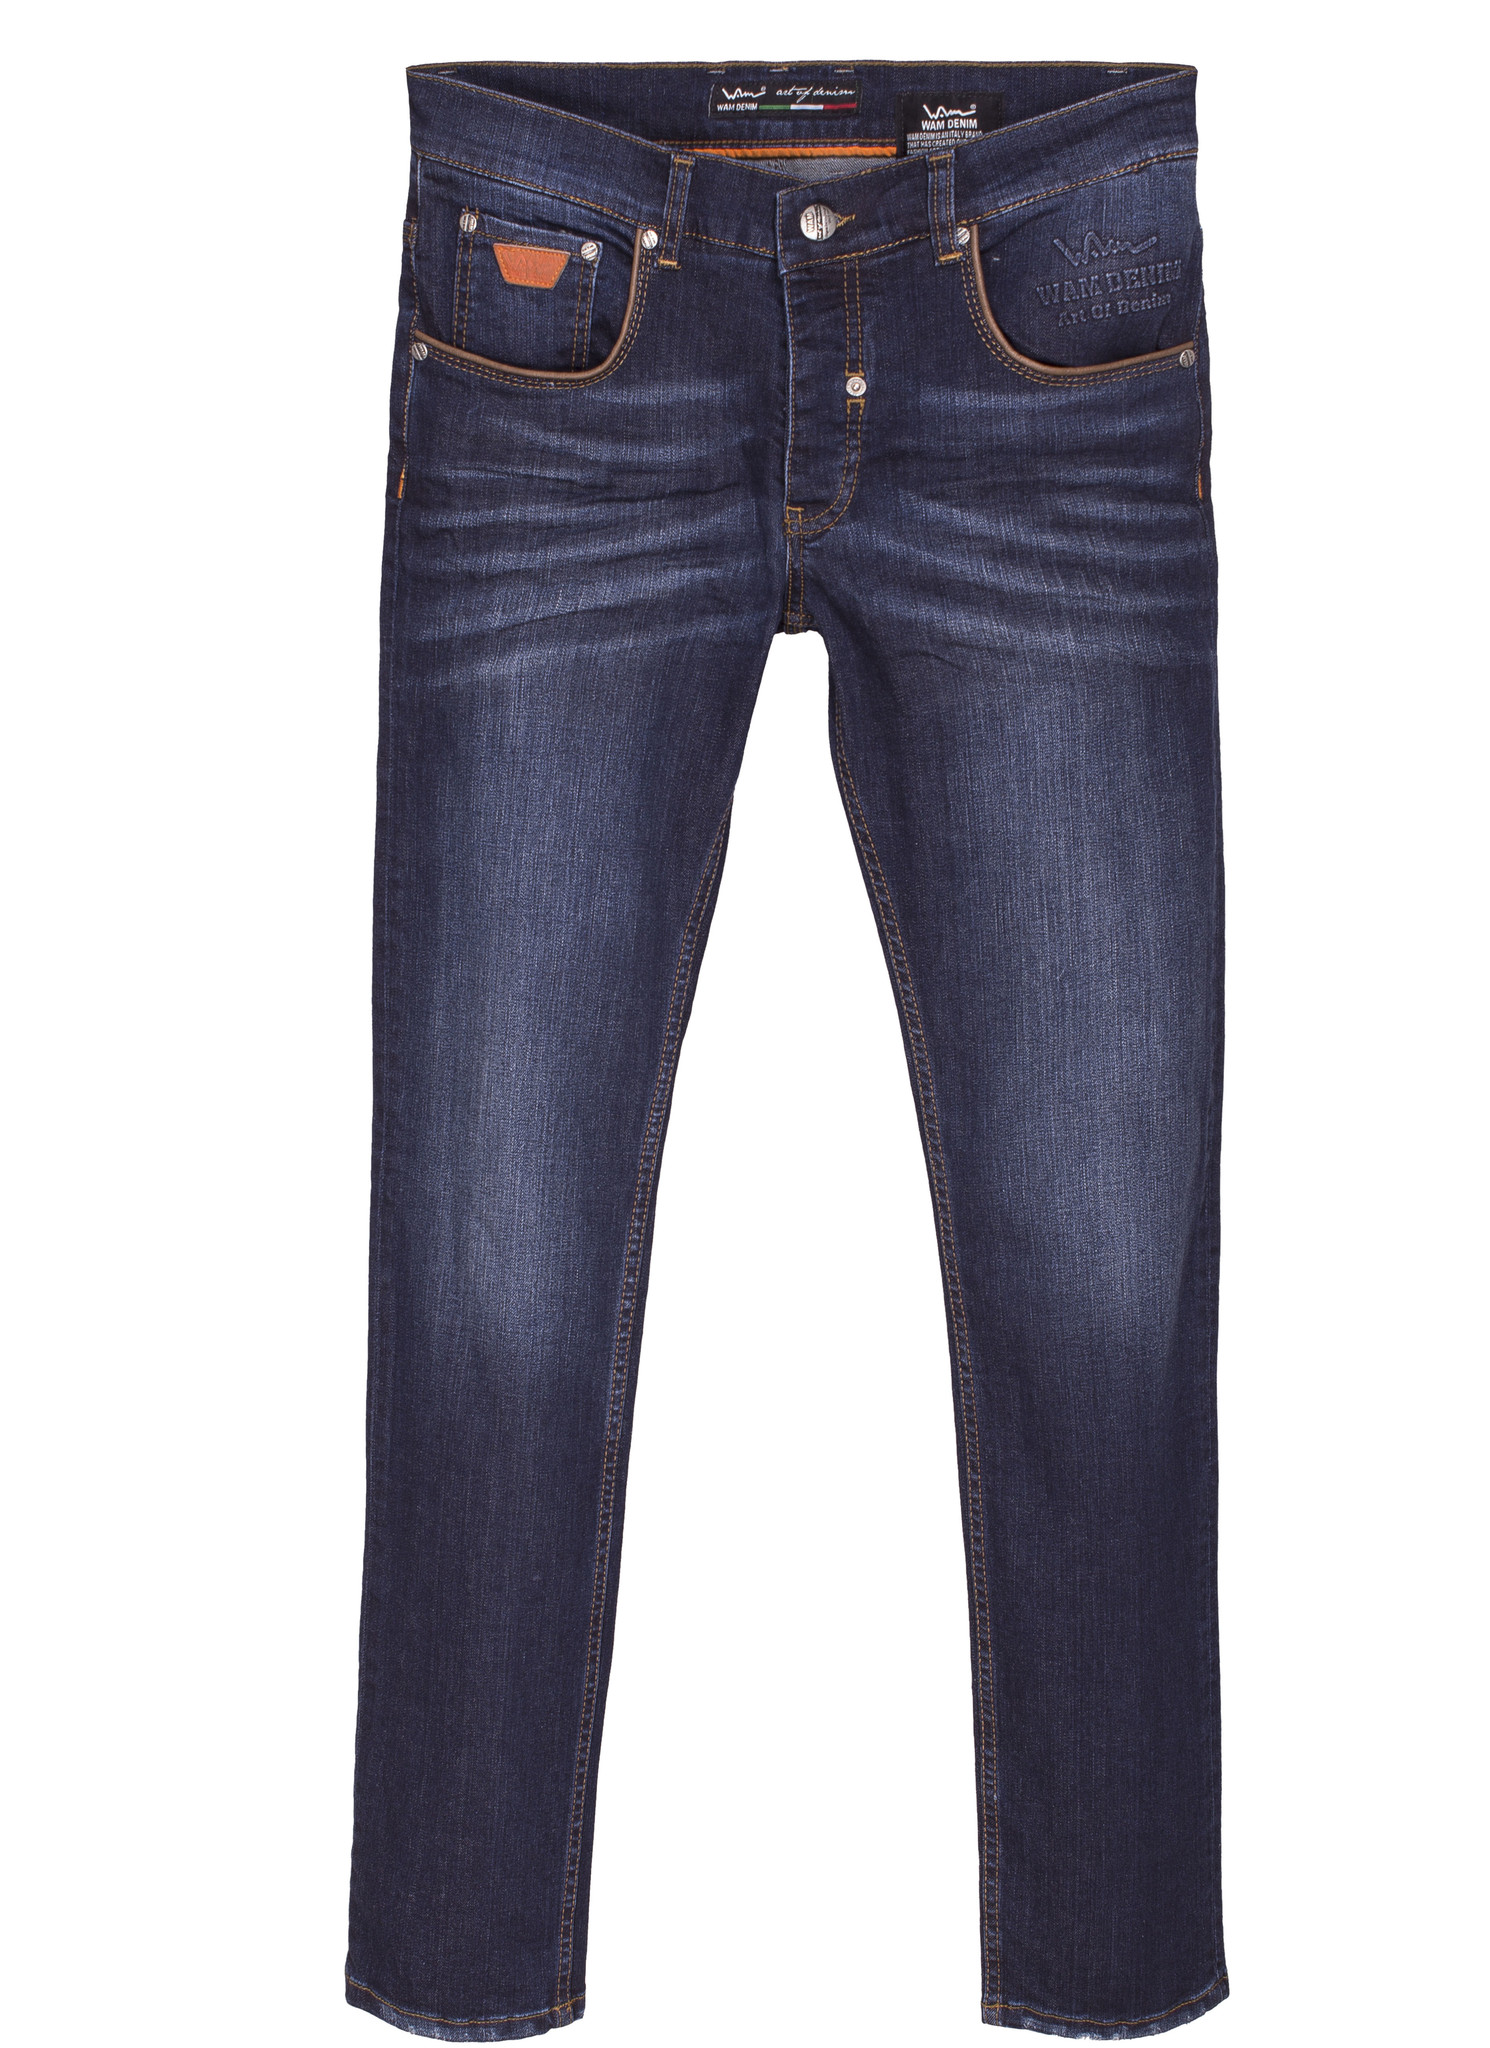 Wam Denim Jeans 72020 Blue